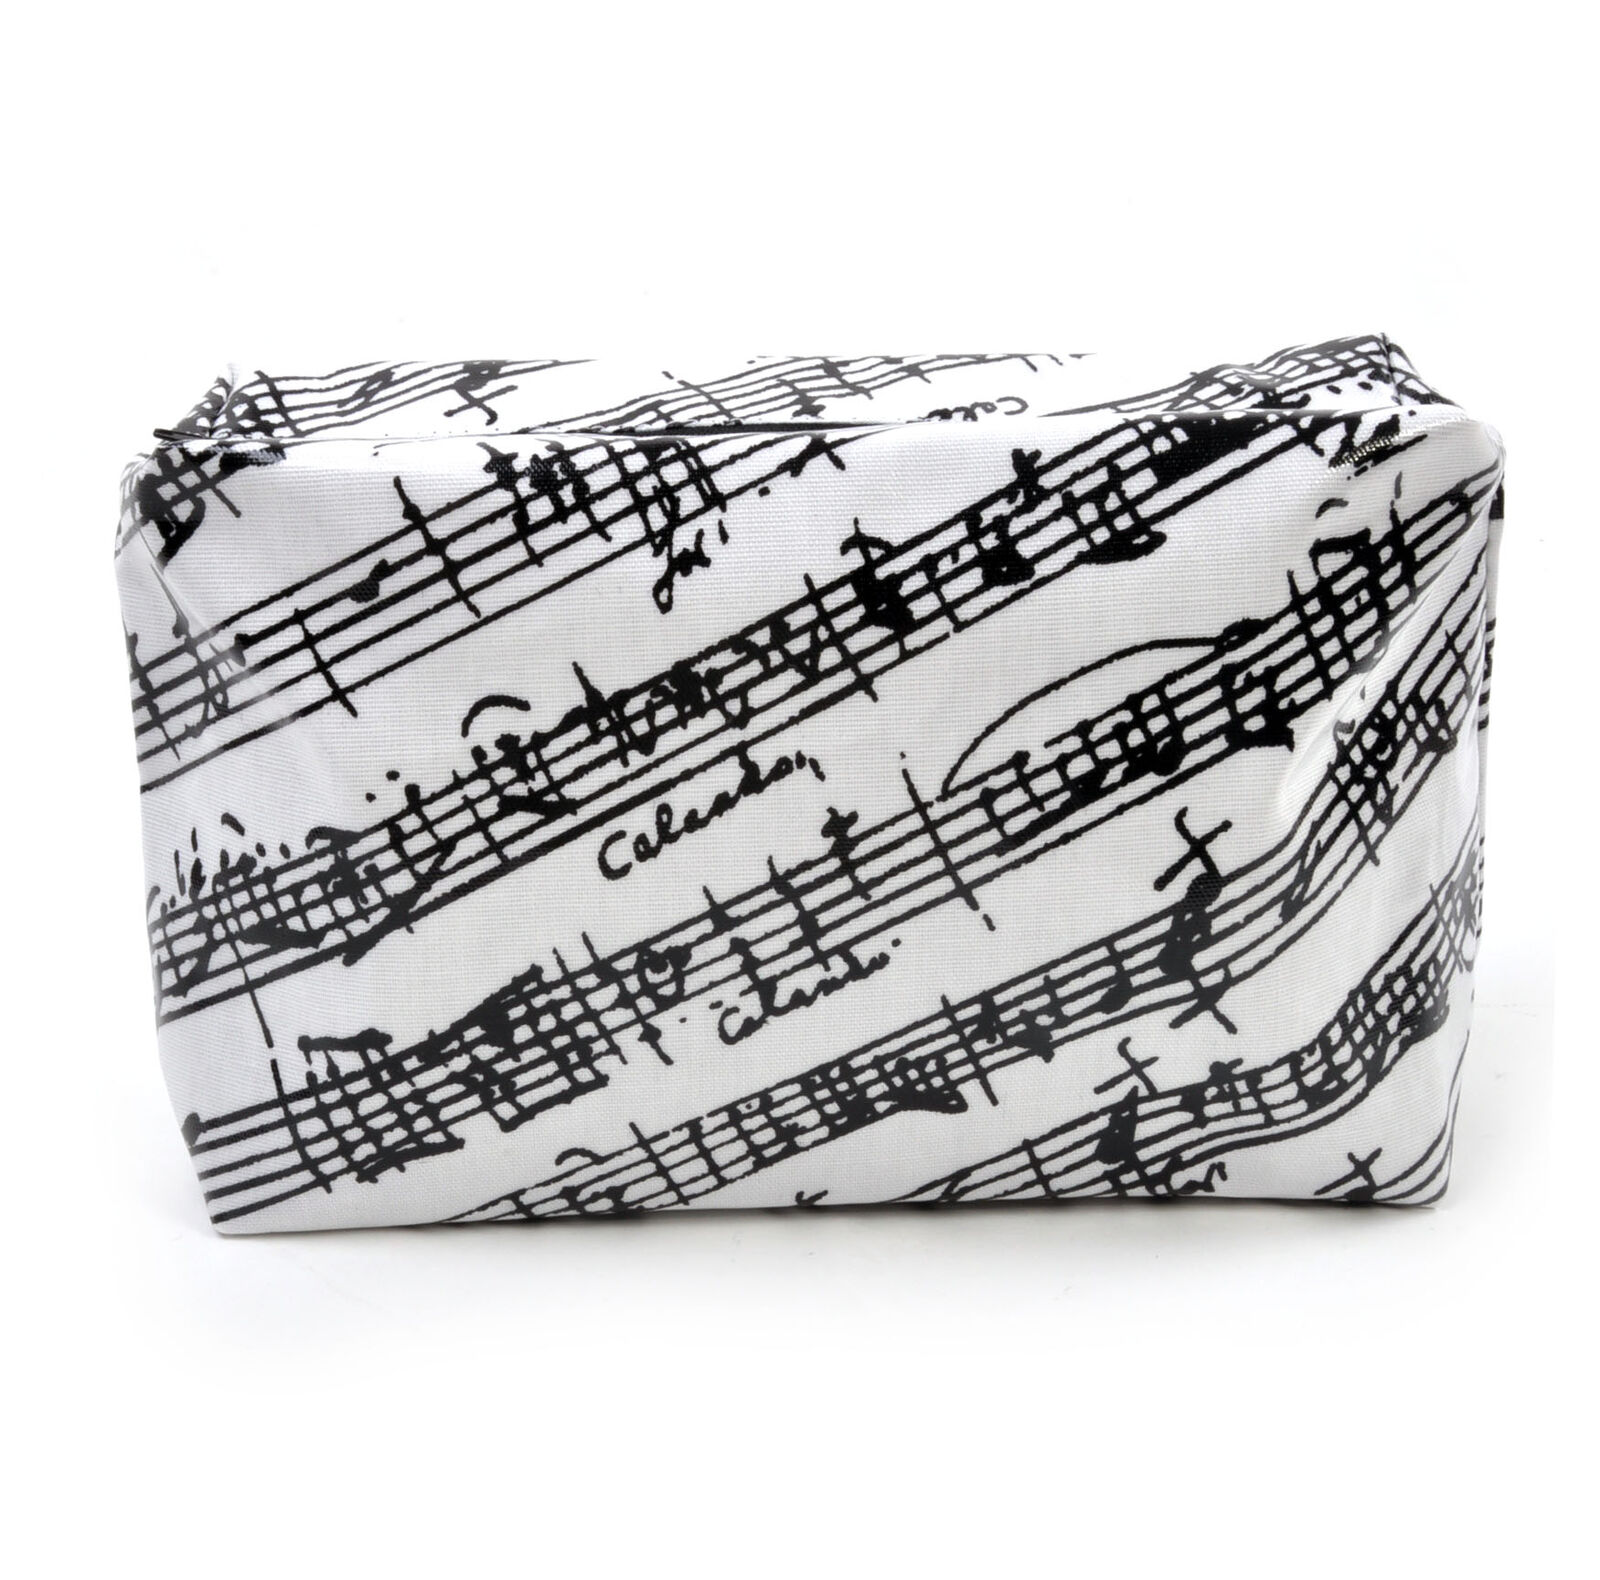 Musique Manuscrit Noir Noir Noir & Blanc Washbag/Make Up Bag 0549f2